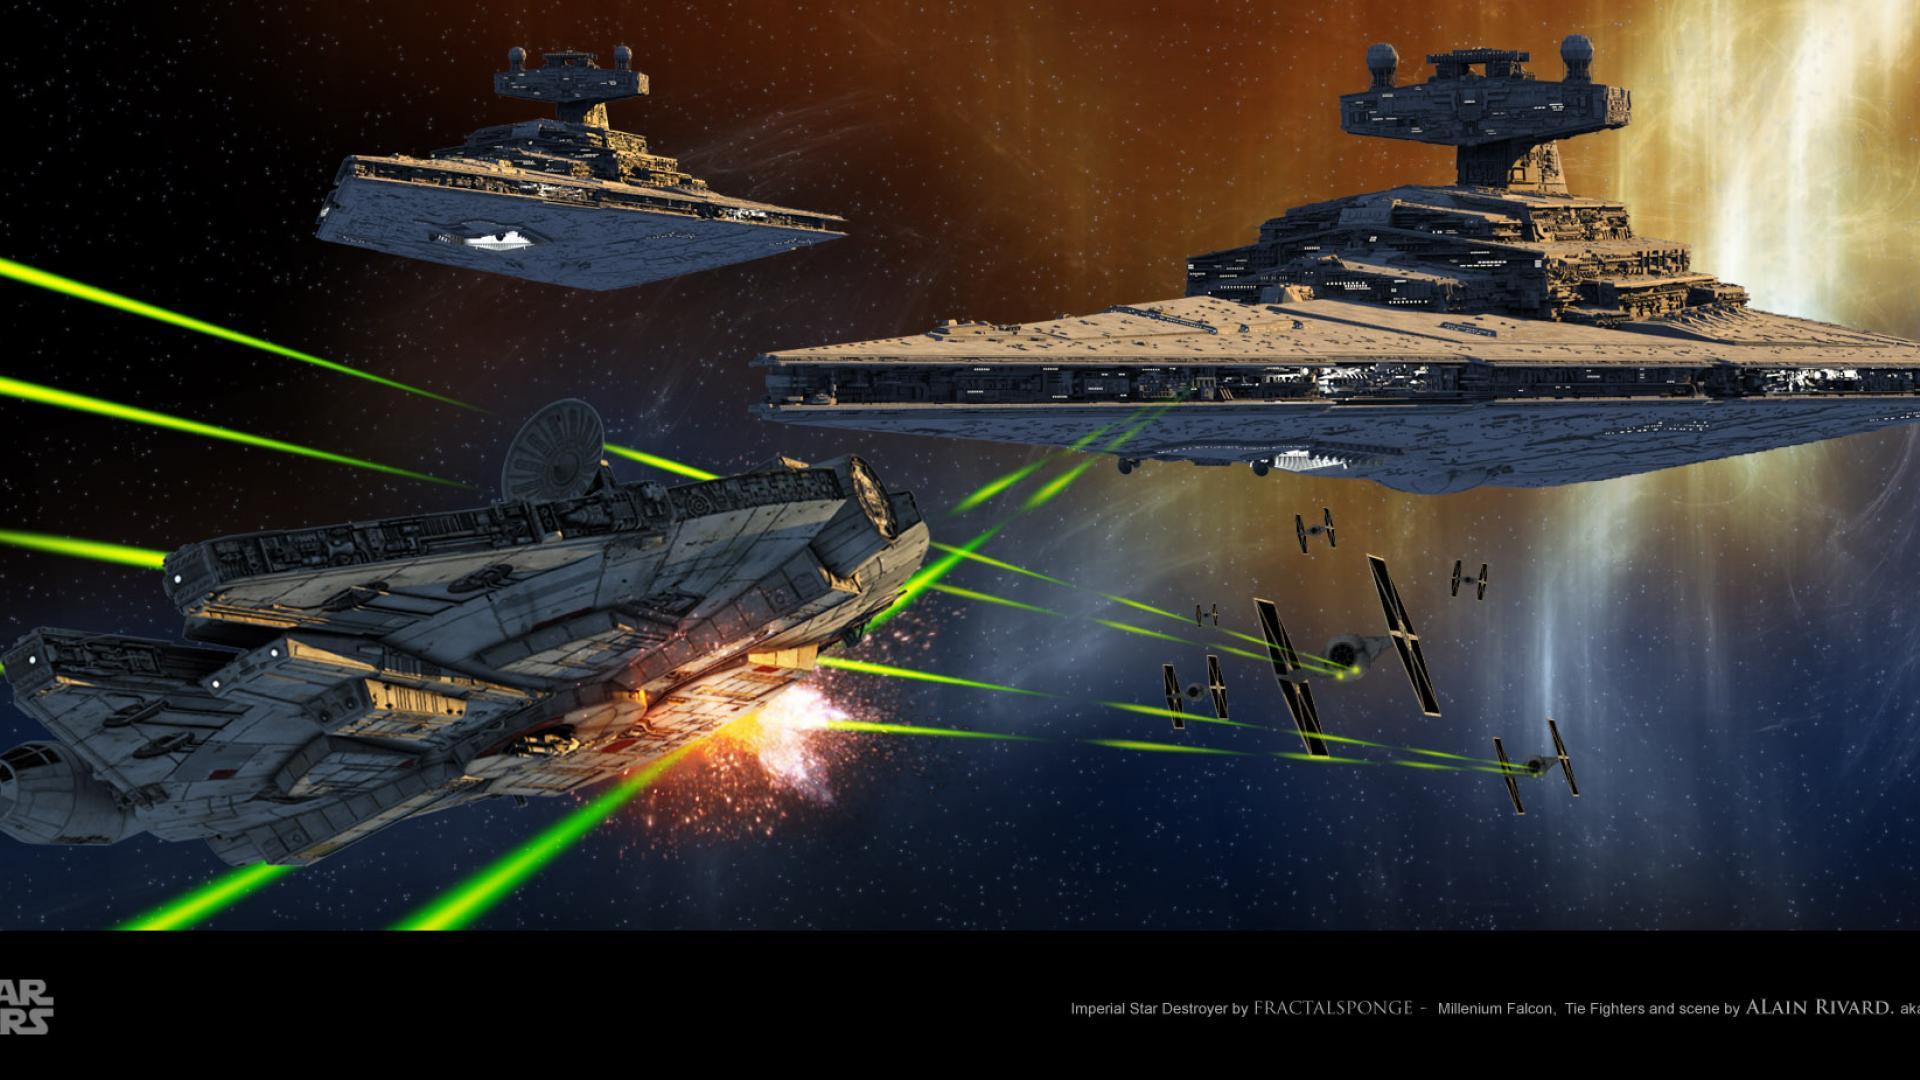 Millennium falcon star destroyer star wars wallpaper HQ WALLPAPER 1920x1080